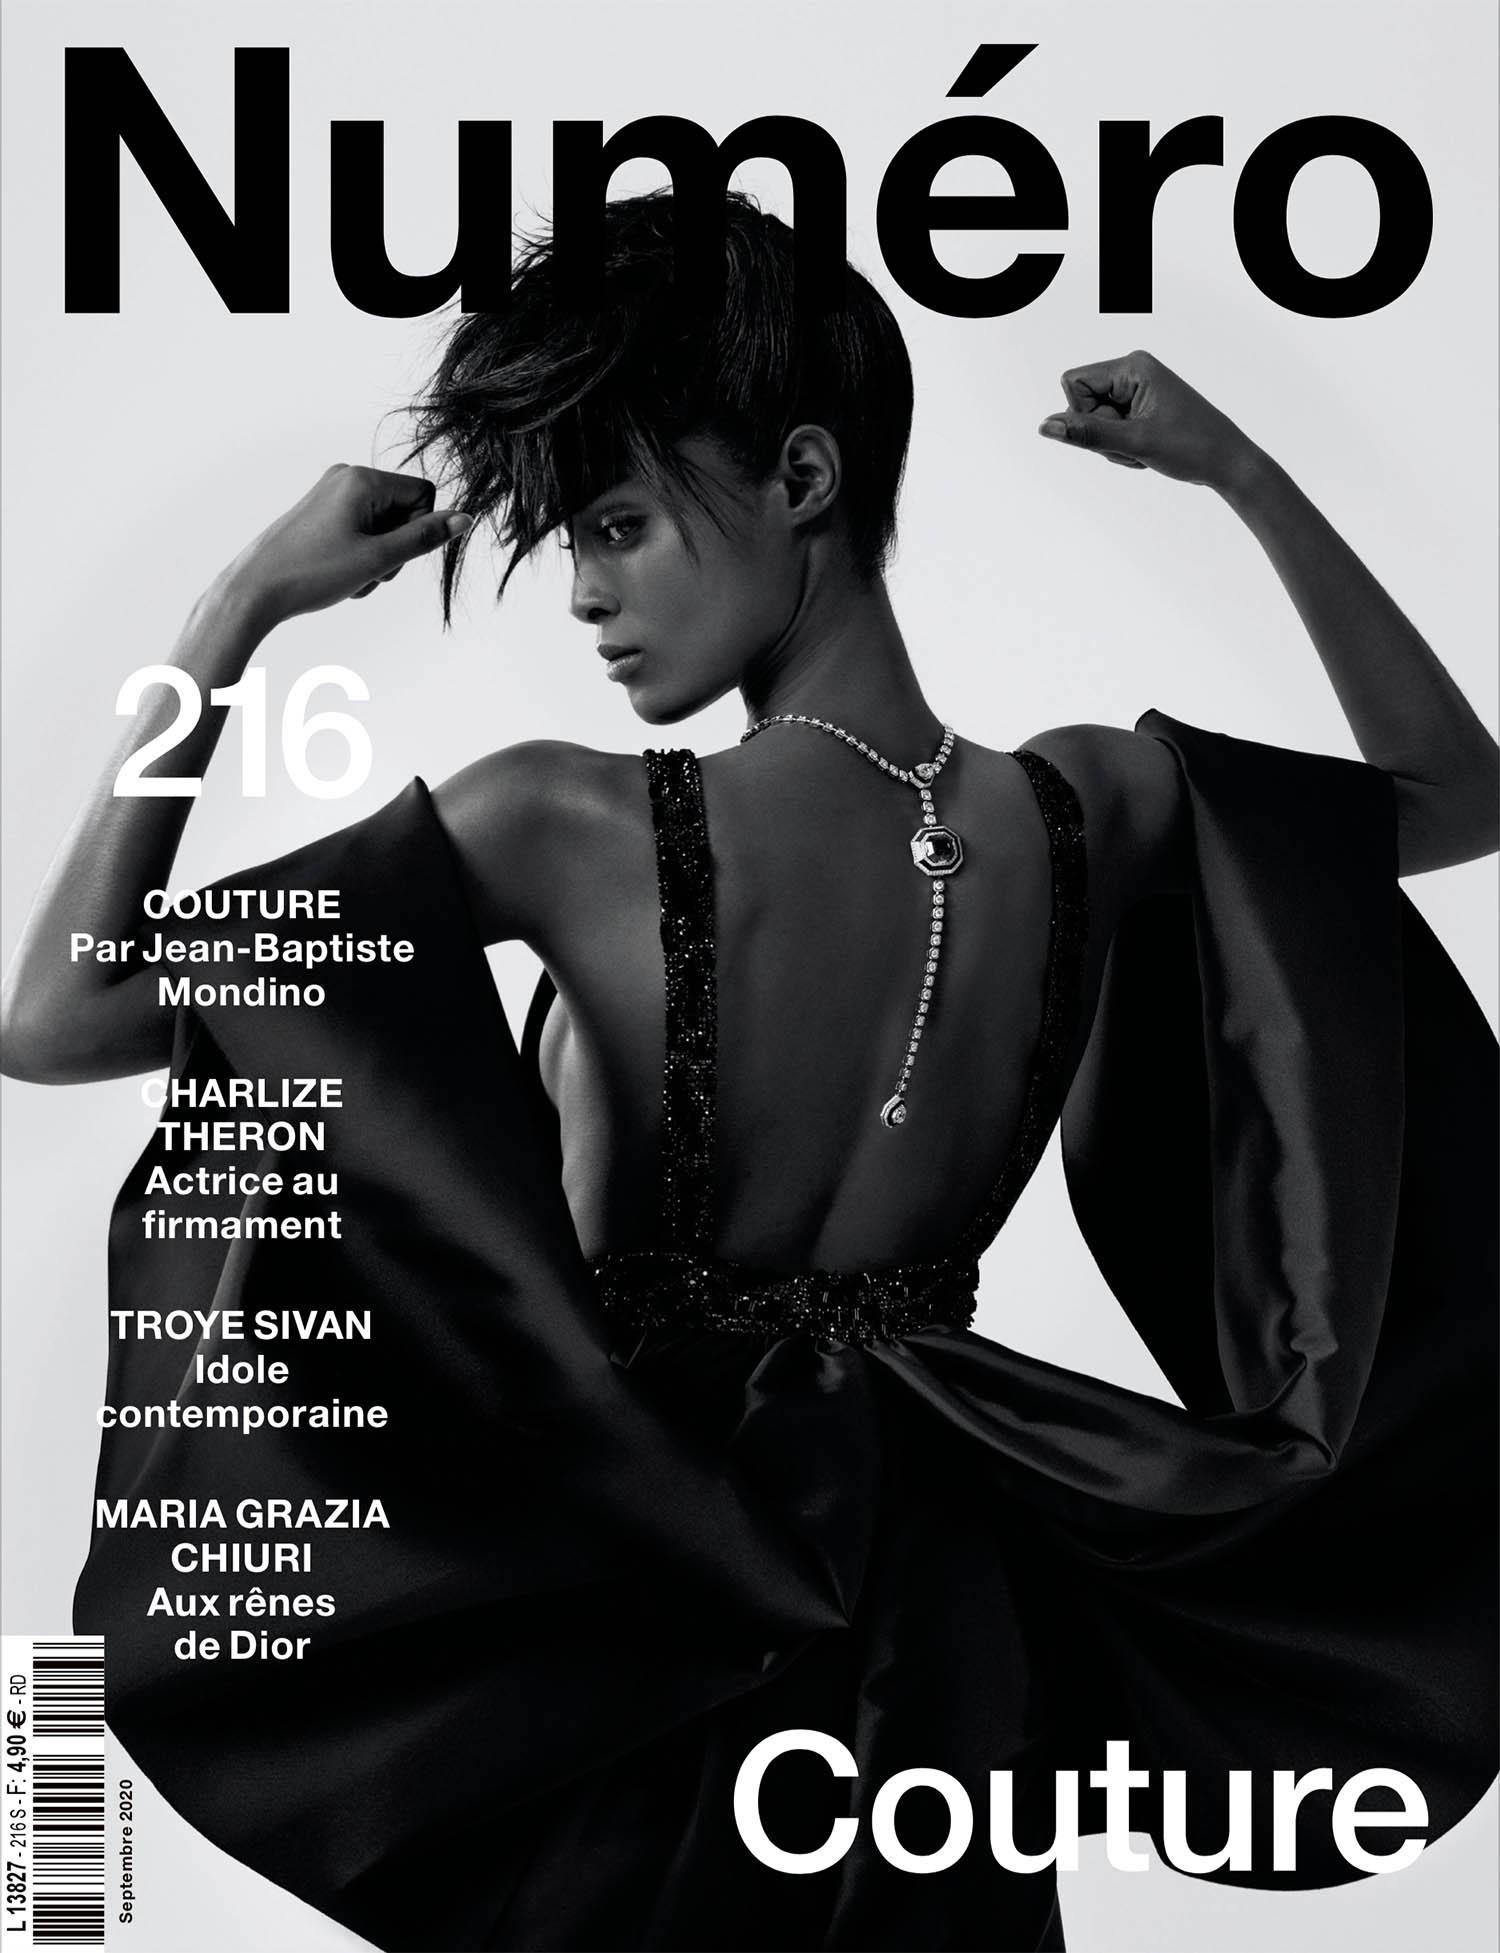 Malika Louback and Blesnya Minher cover Numéro September 2020 by Jean-Baptiste Mondino